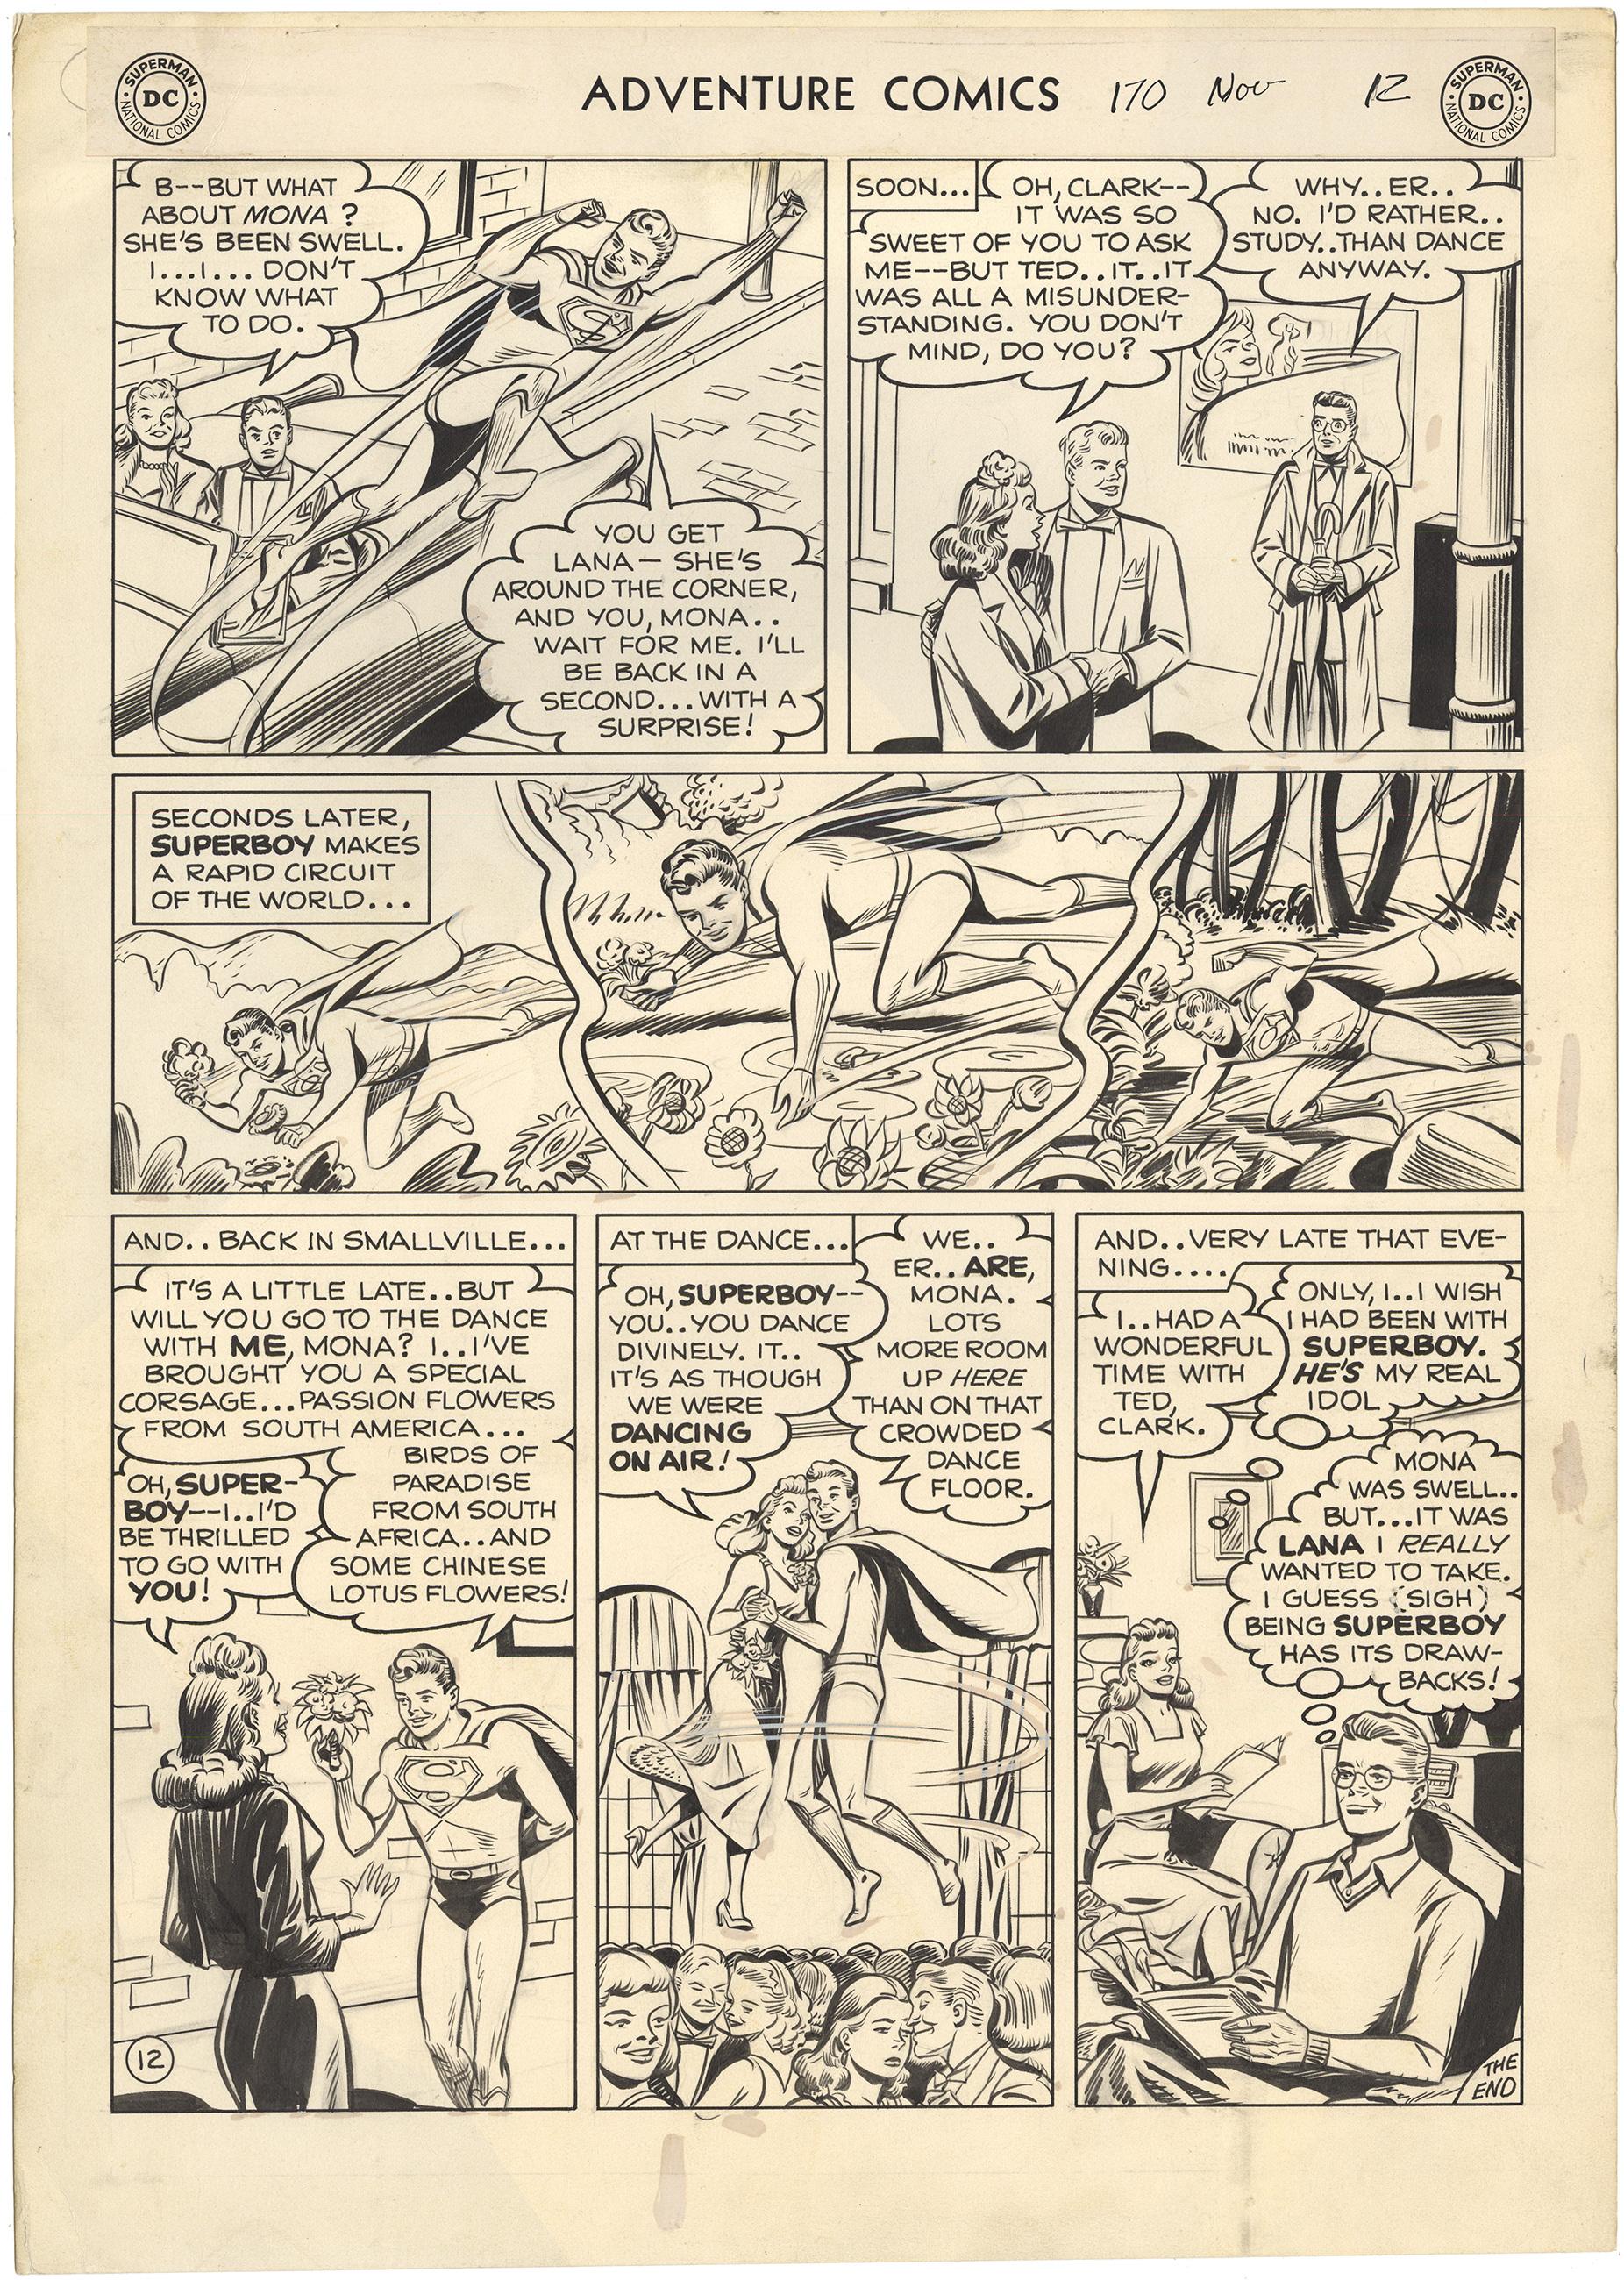 Adventure Comics #170 p12 (Large Art)